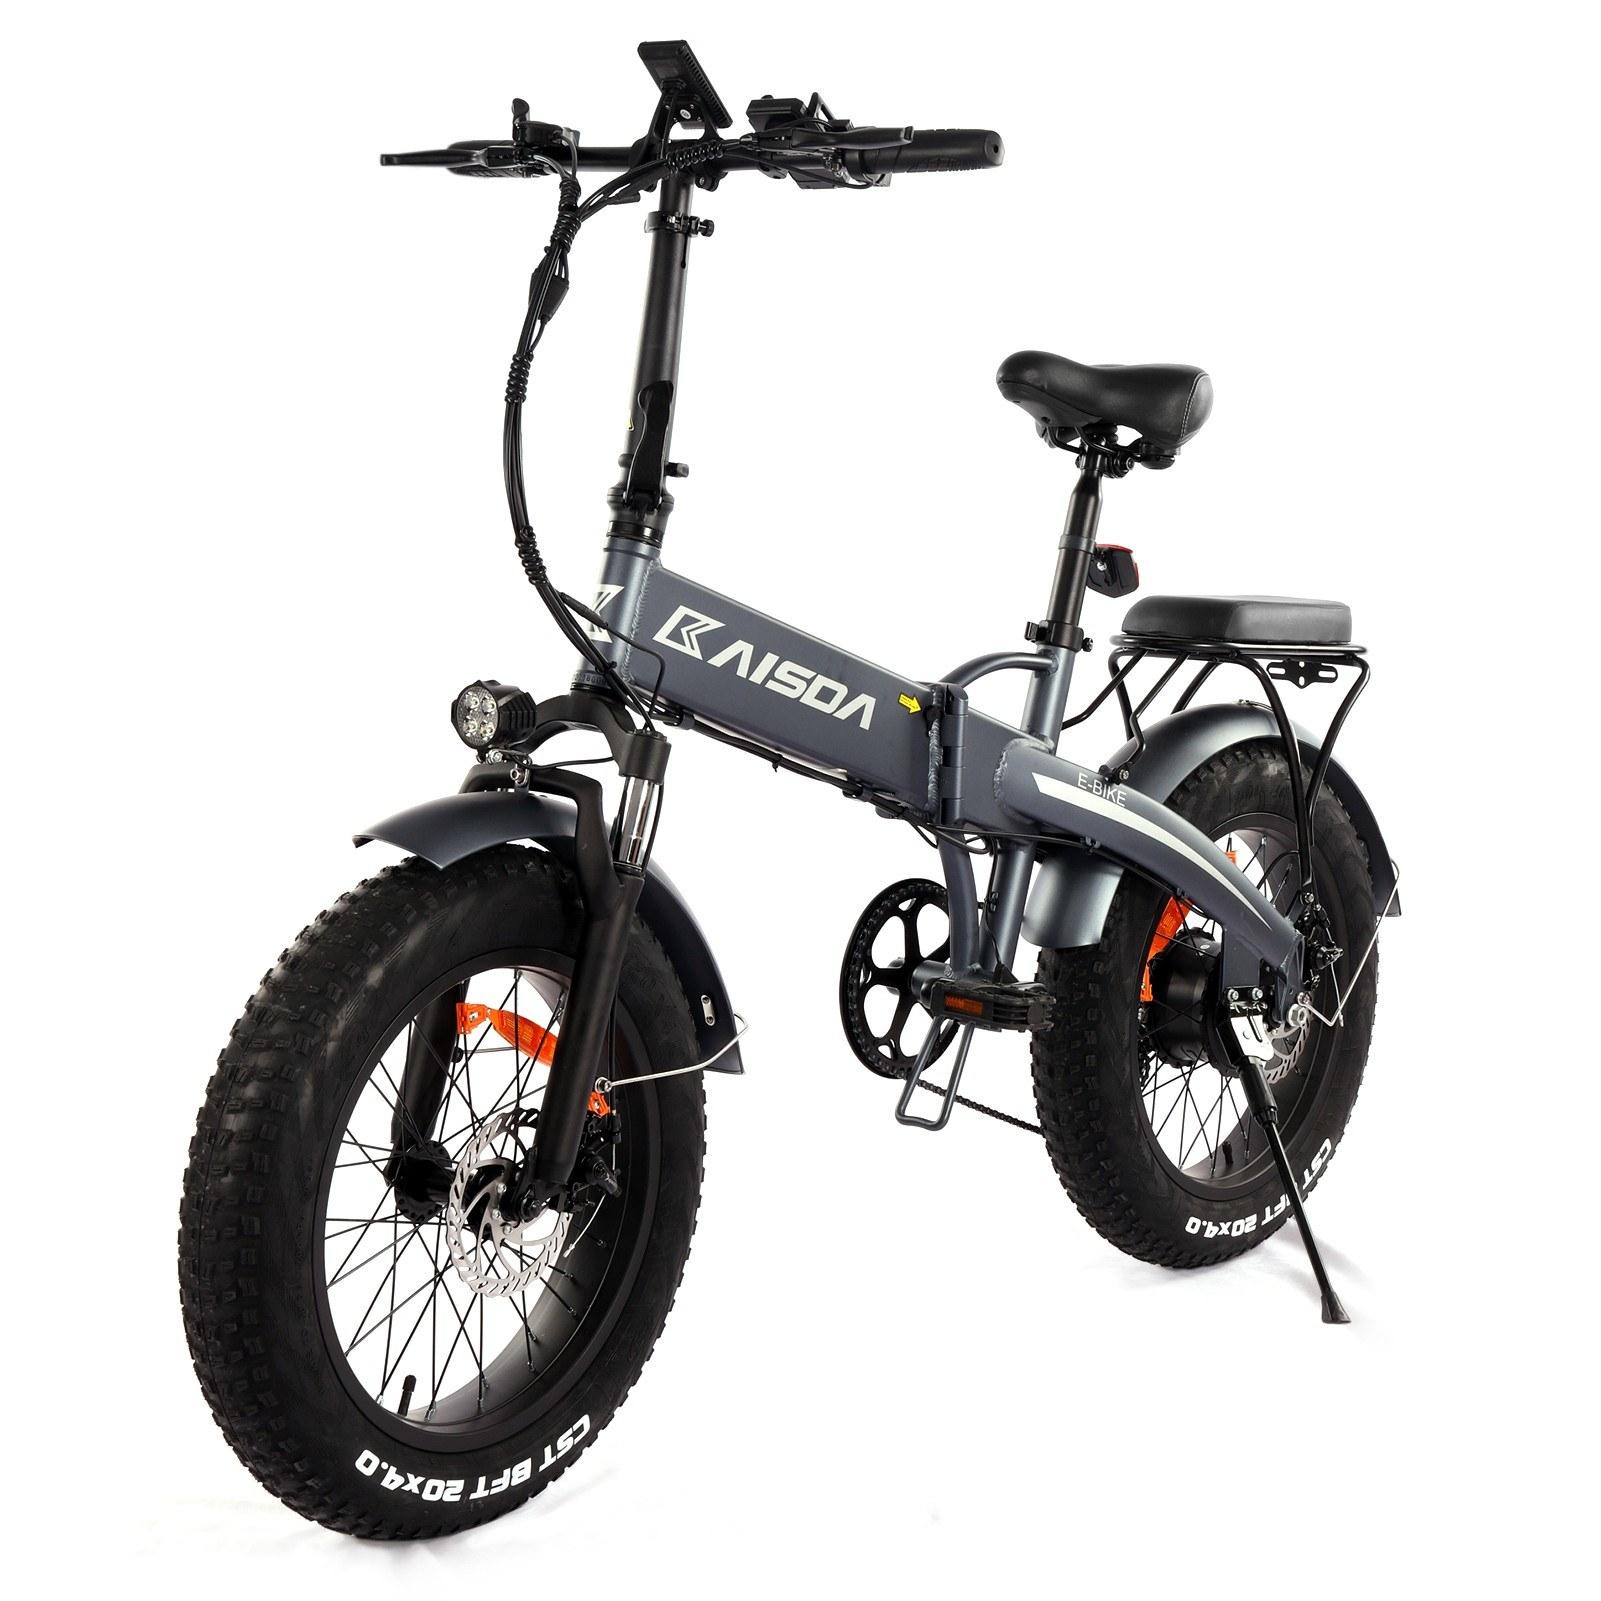 tomtop.com - [EU Warehouse] 43% OFF KAISDA K2 Folding Electric Bike with 20*4.0 Fat Tire 48V 10AH 500W, $1139.99 (Inclusive of VAT)